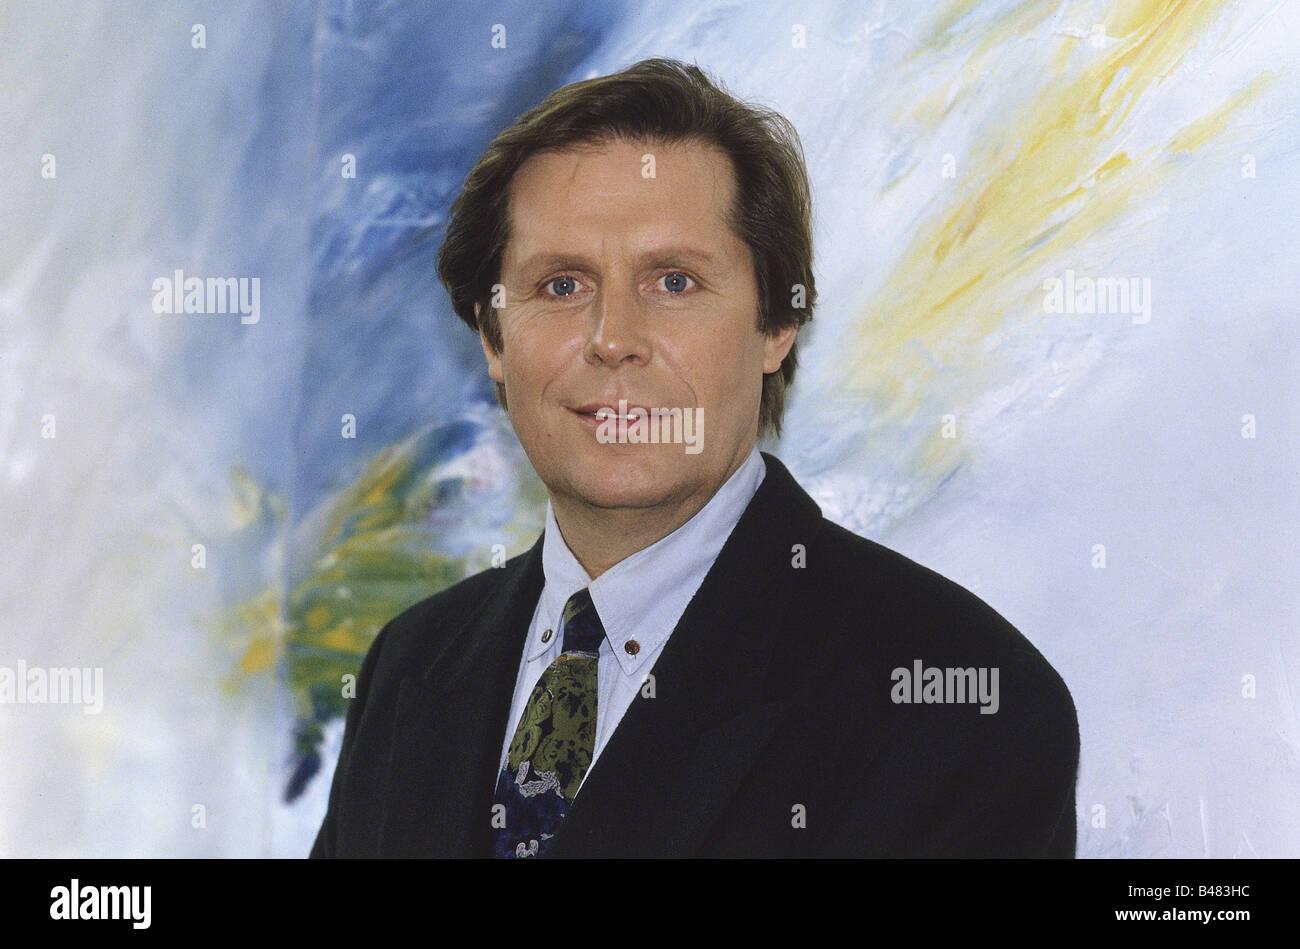 solbach sigmar 3 10 1946 grman actor portrait 1995 stock